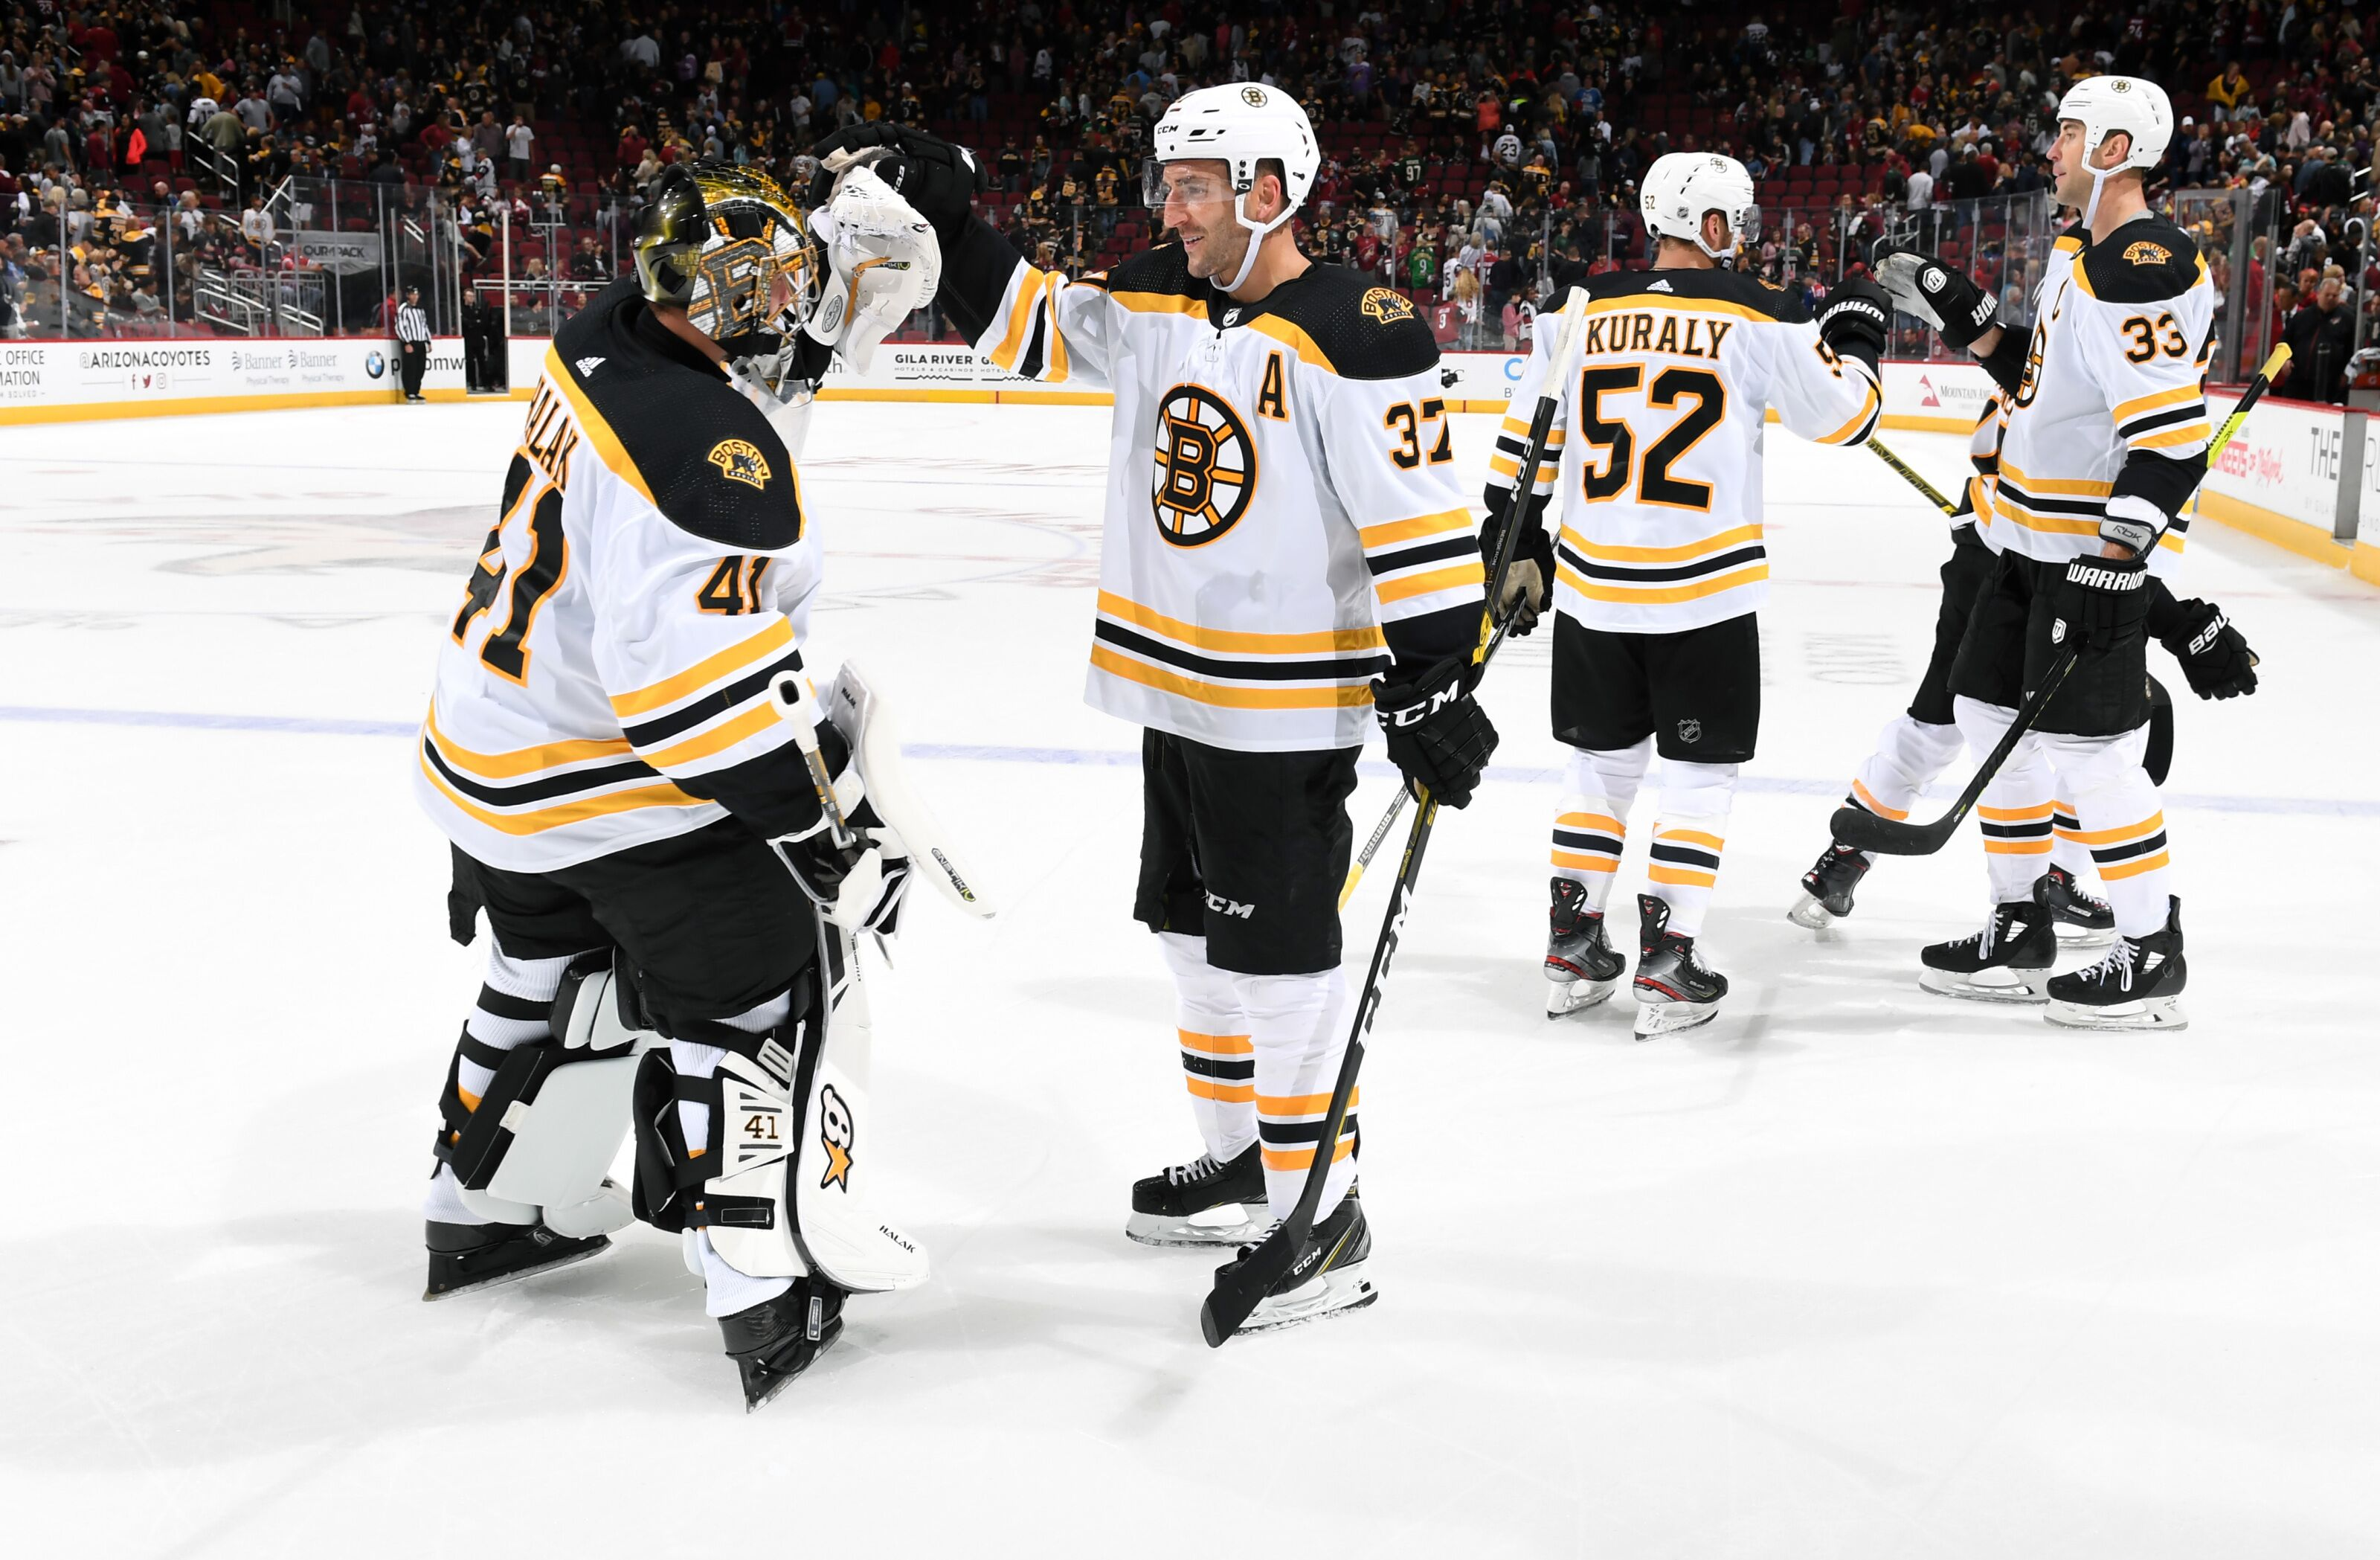 Boston Bruins: Jaroslav Halak the difference maker against Coyotes